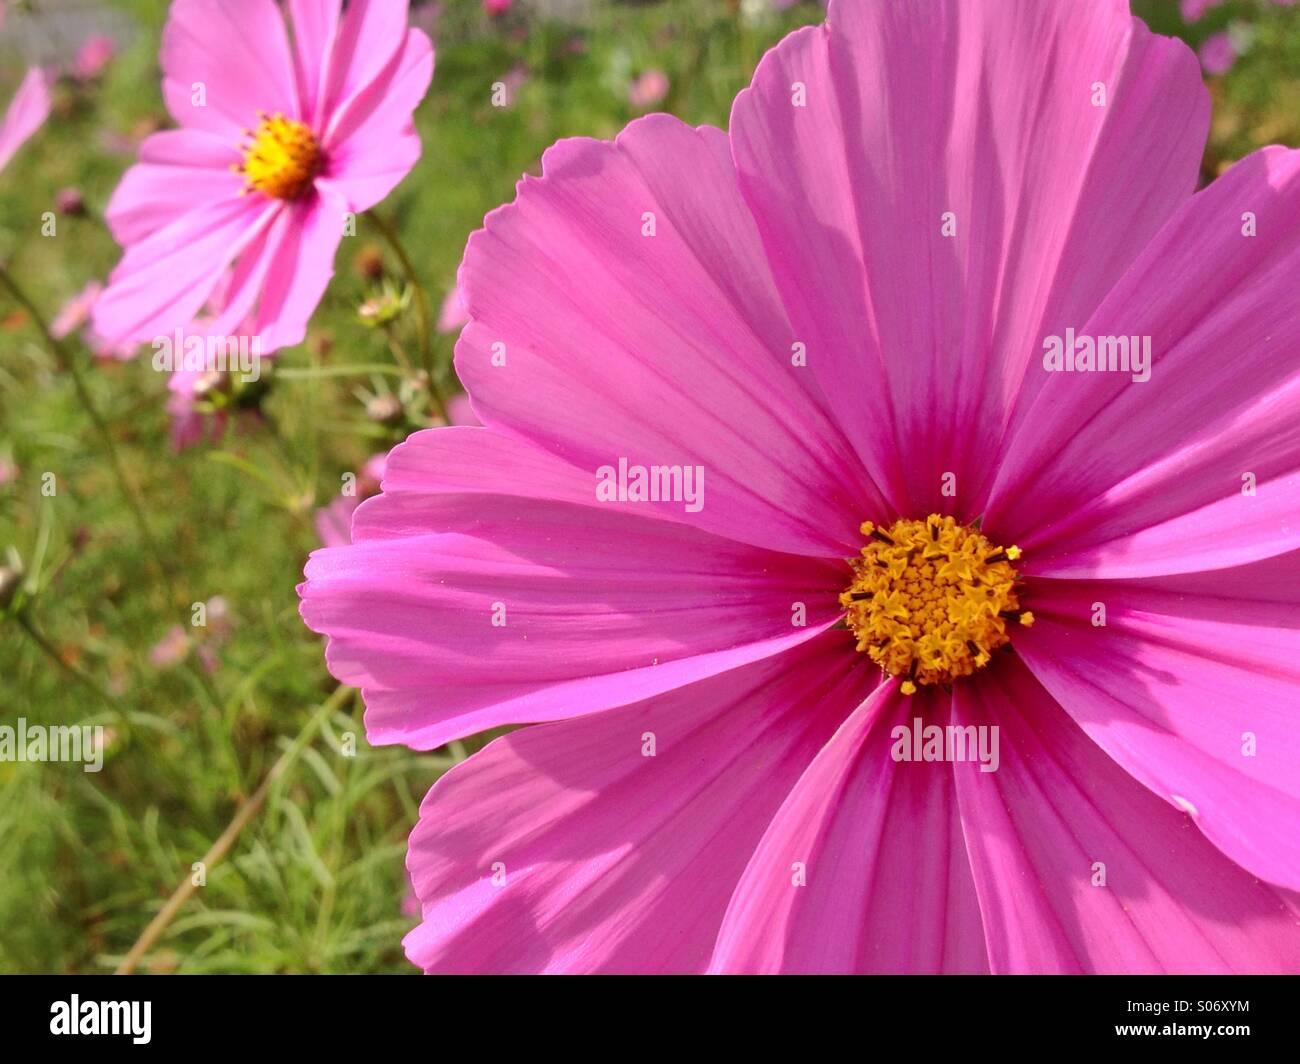 Pink Portraits - Stock Image